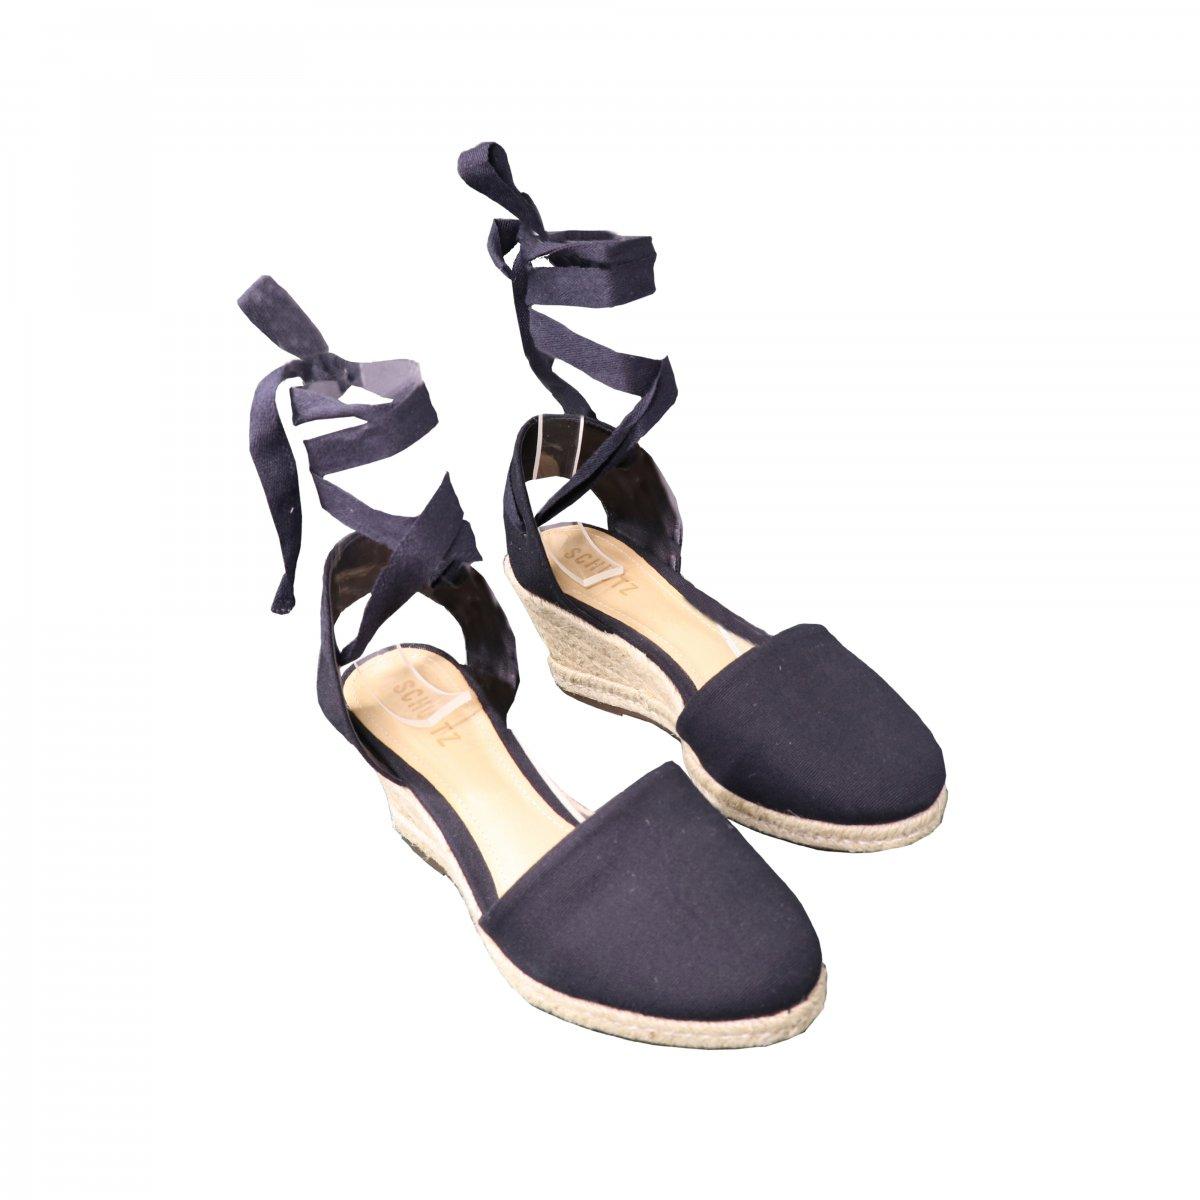 845fe7f74 Sandália Anabela Espadrille Black Schutz | G&Co Shoes